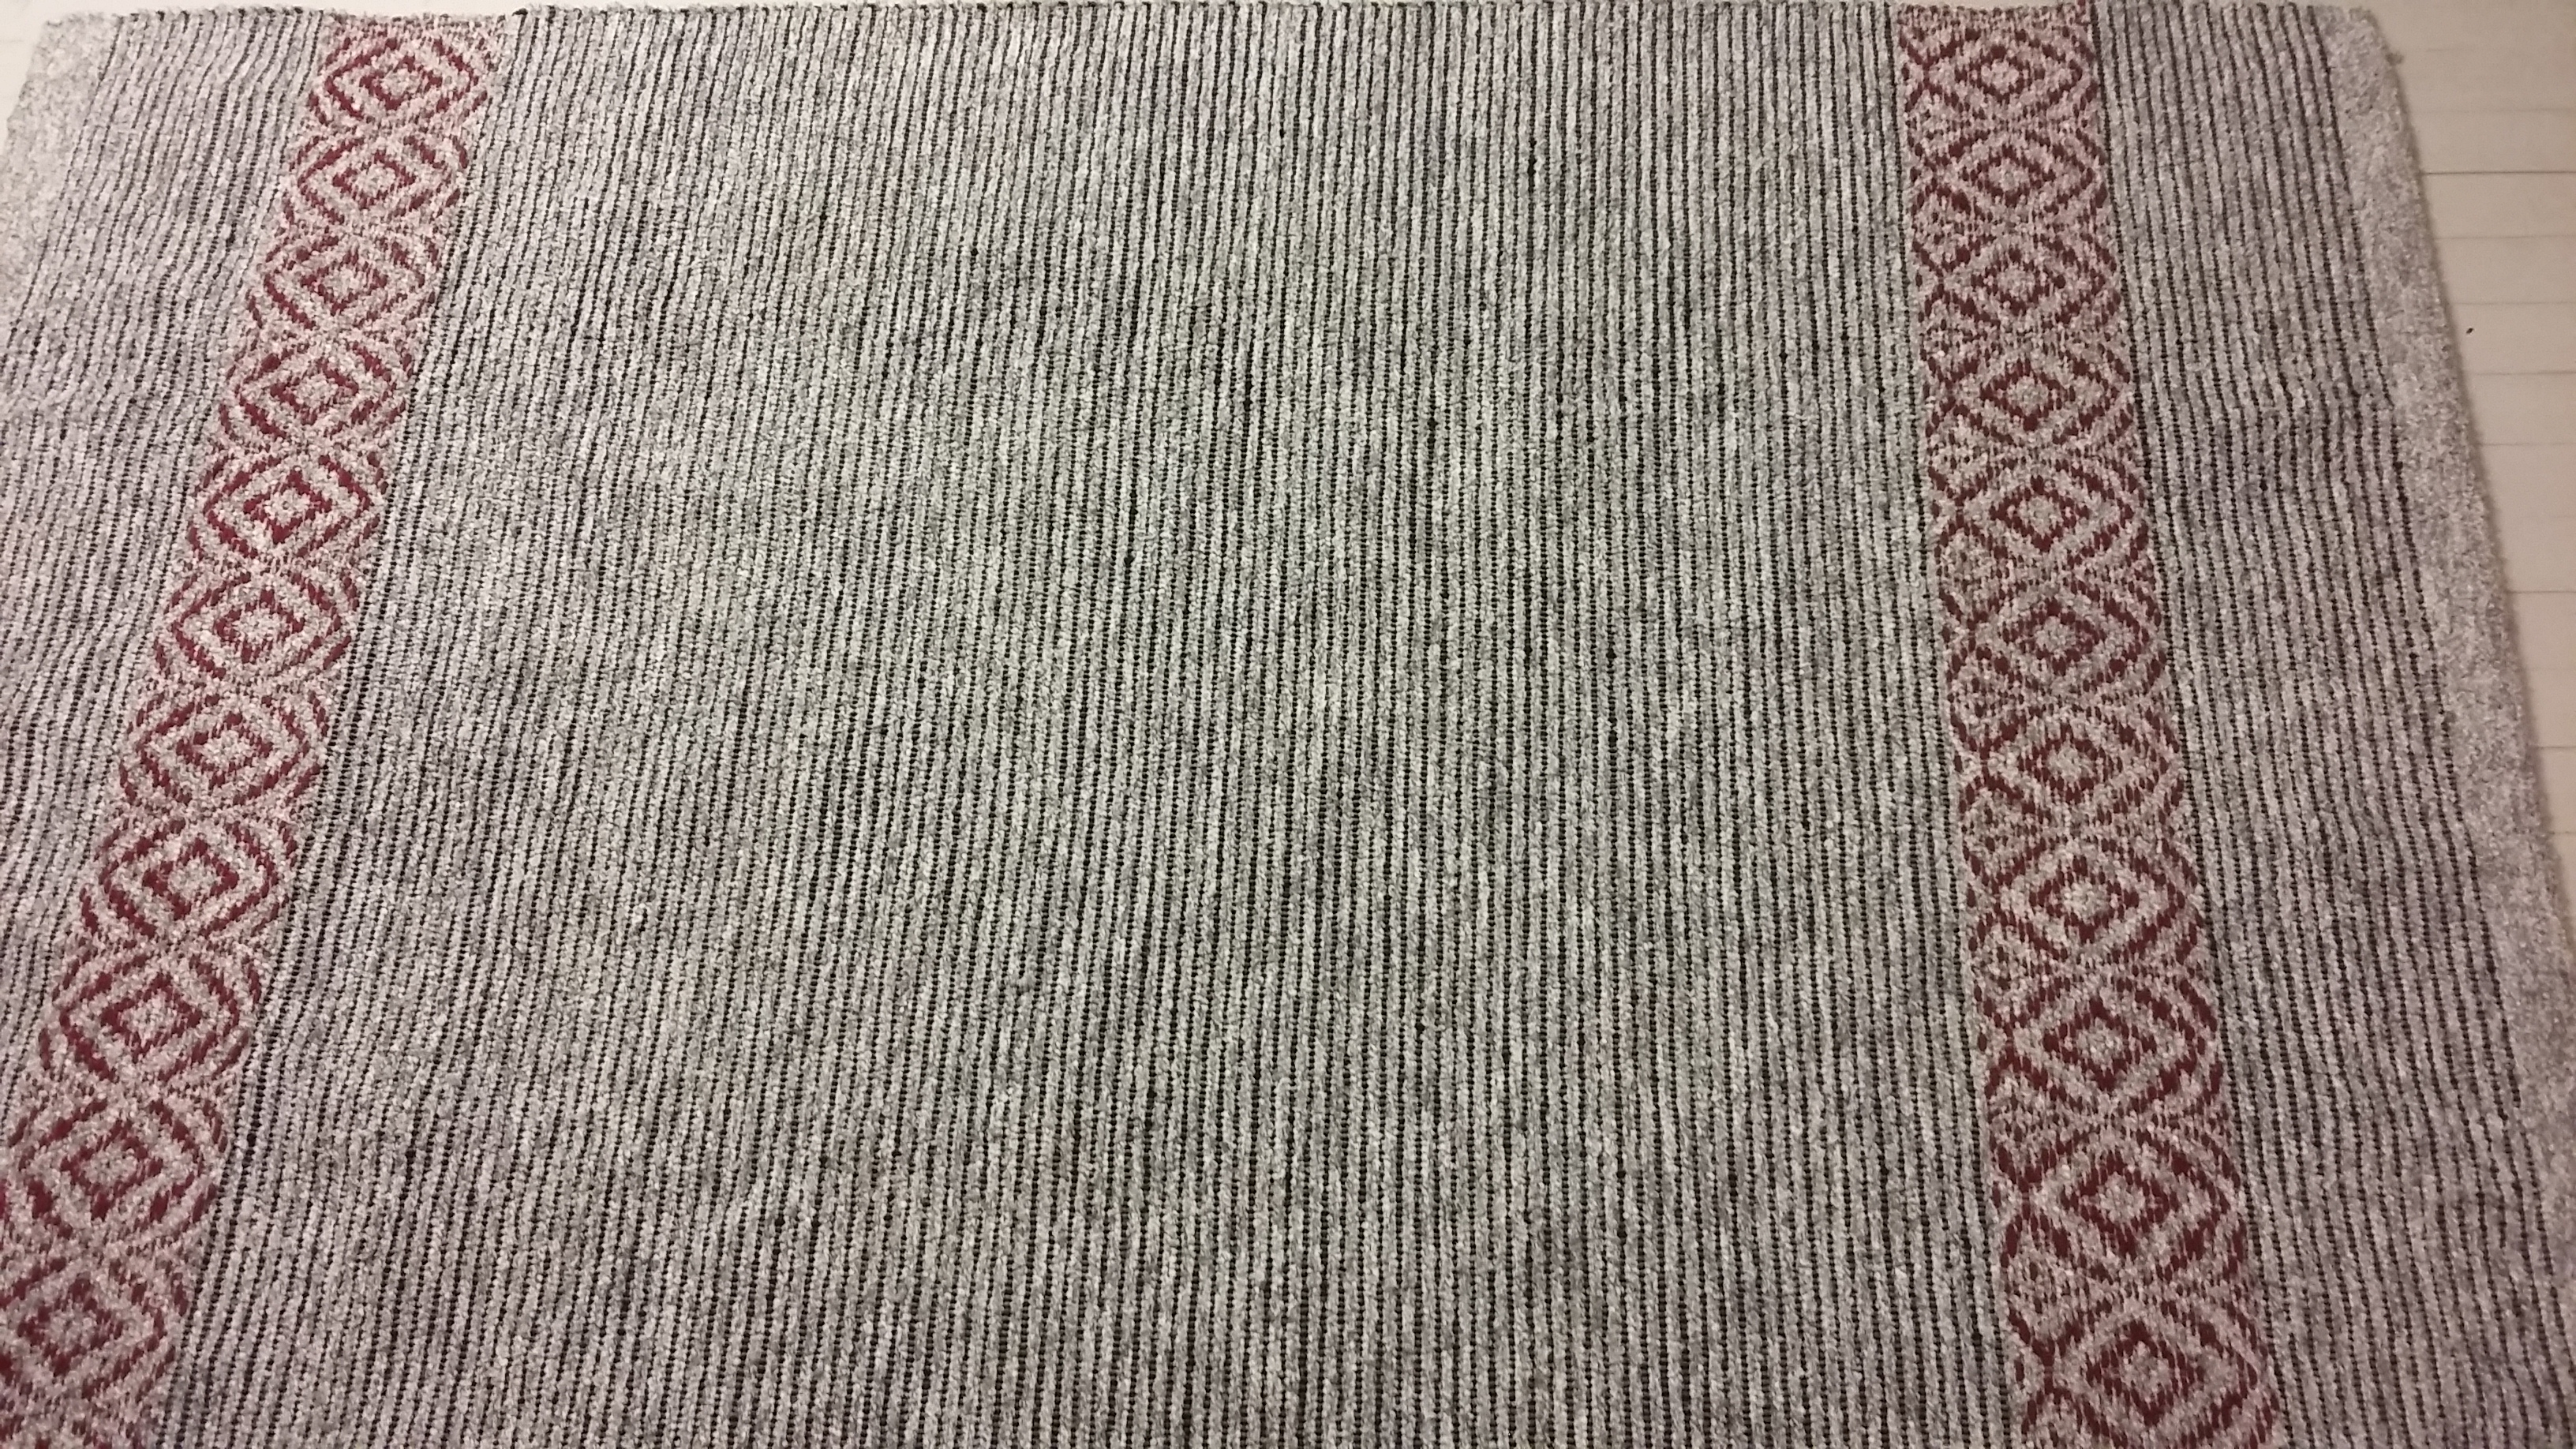 LP-lankaa ja trikoota, Taalainsidos 1